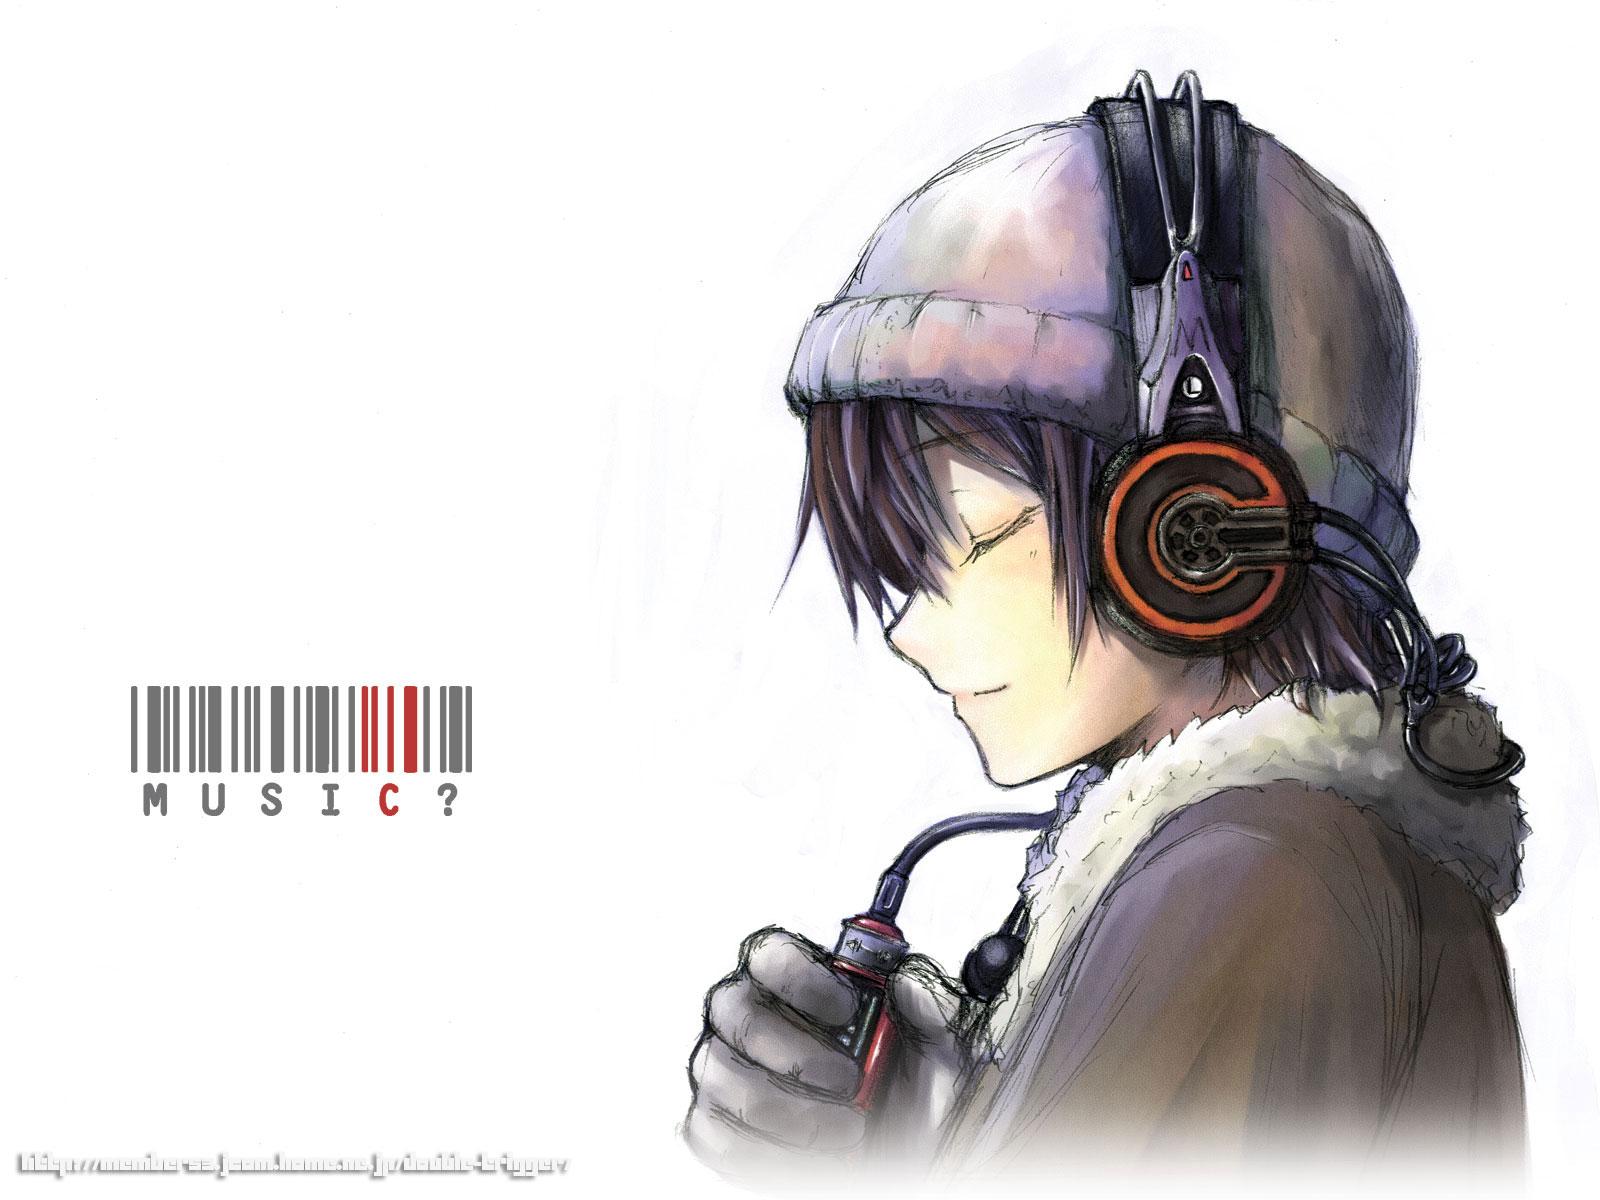 Headphones music anime simple background wallpaper - Anime 1600x1200 ...